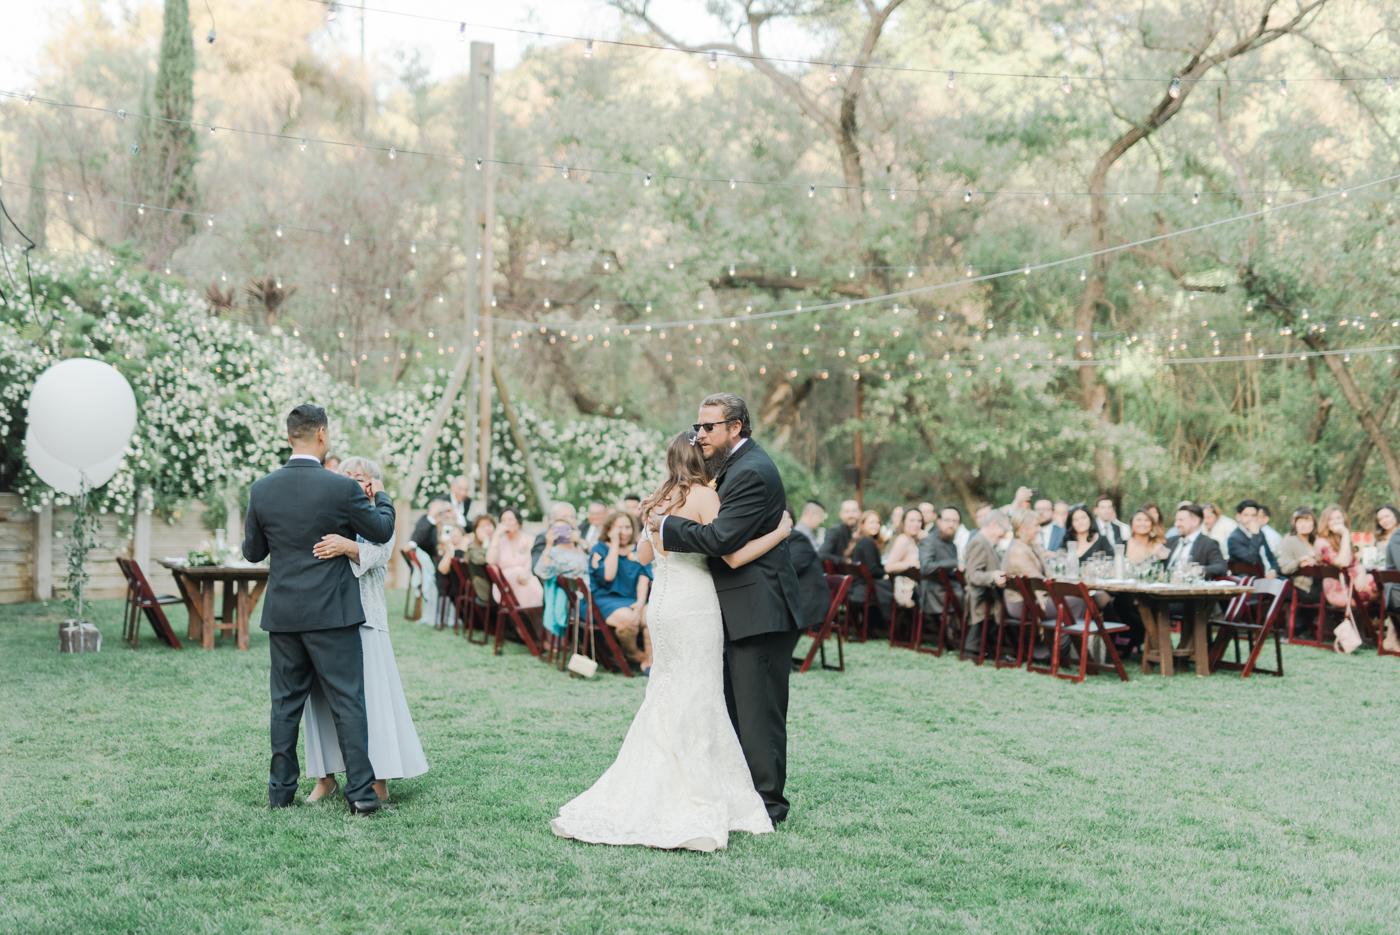 l&c-the_1909_spring_garden_wedding_los_angeles_fine_art_wedding_photographer-33.jpg